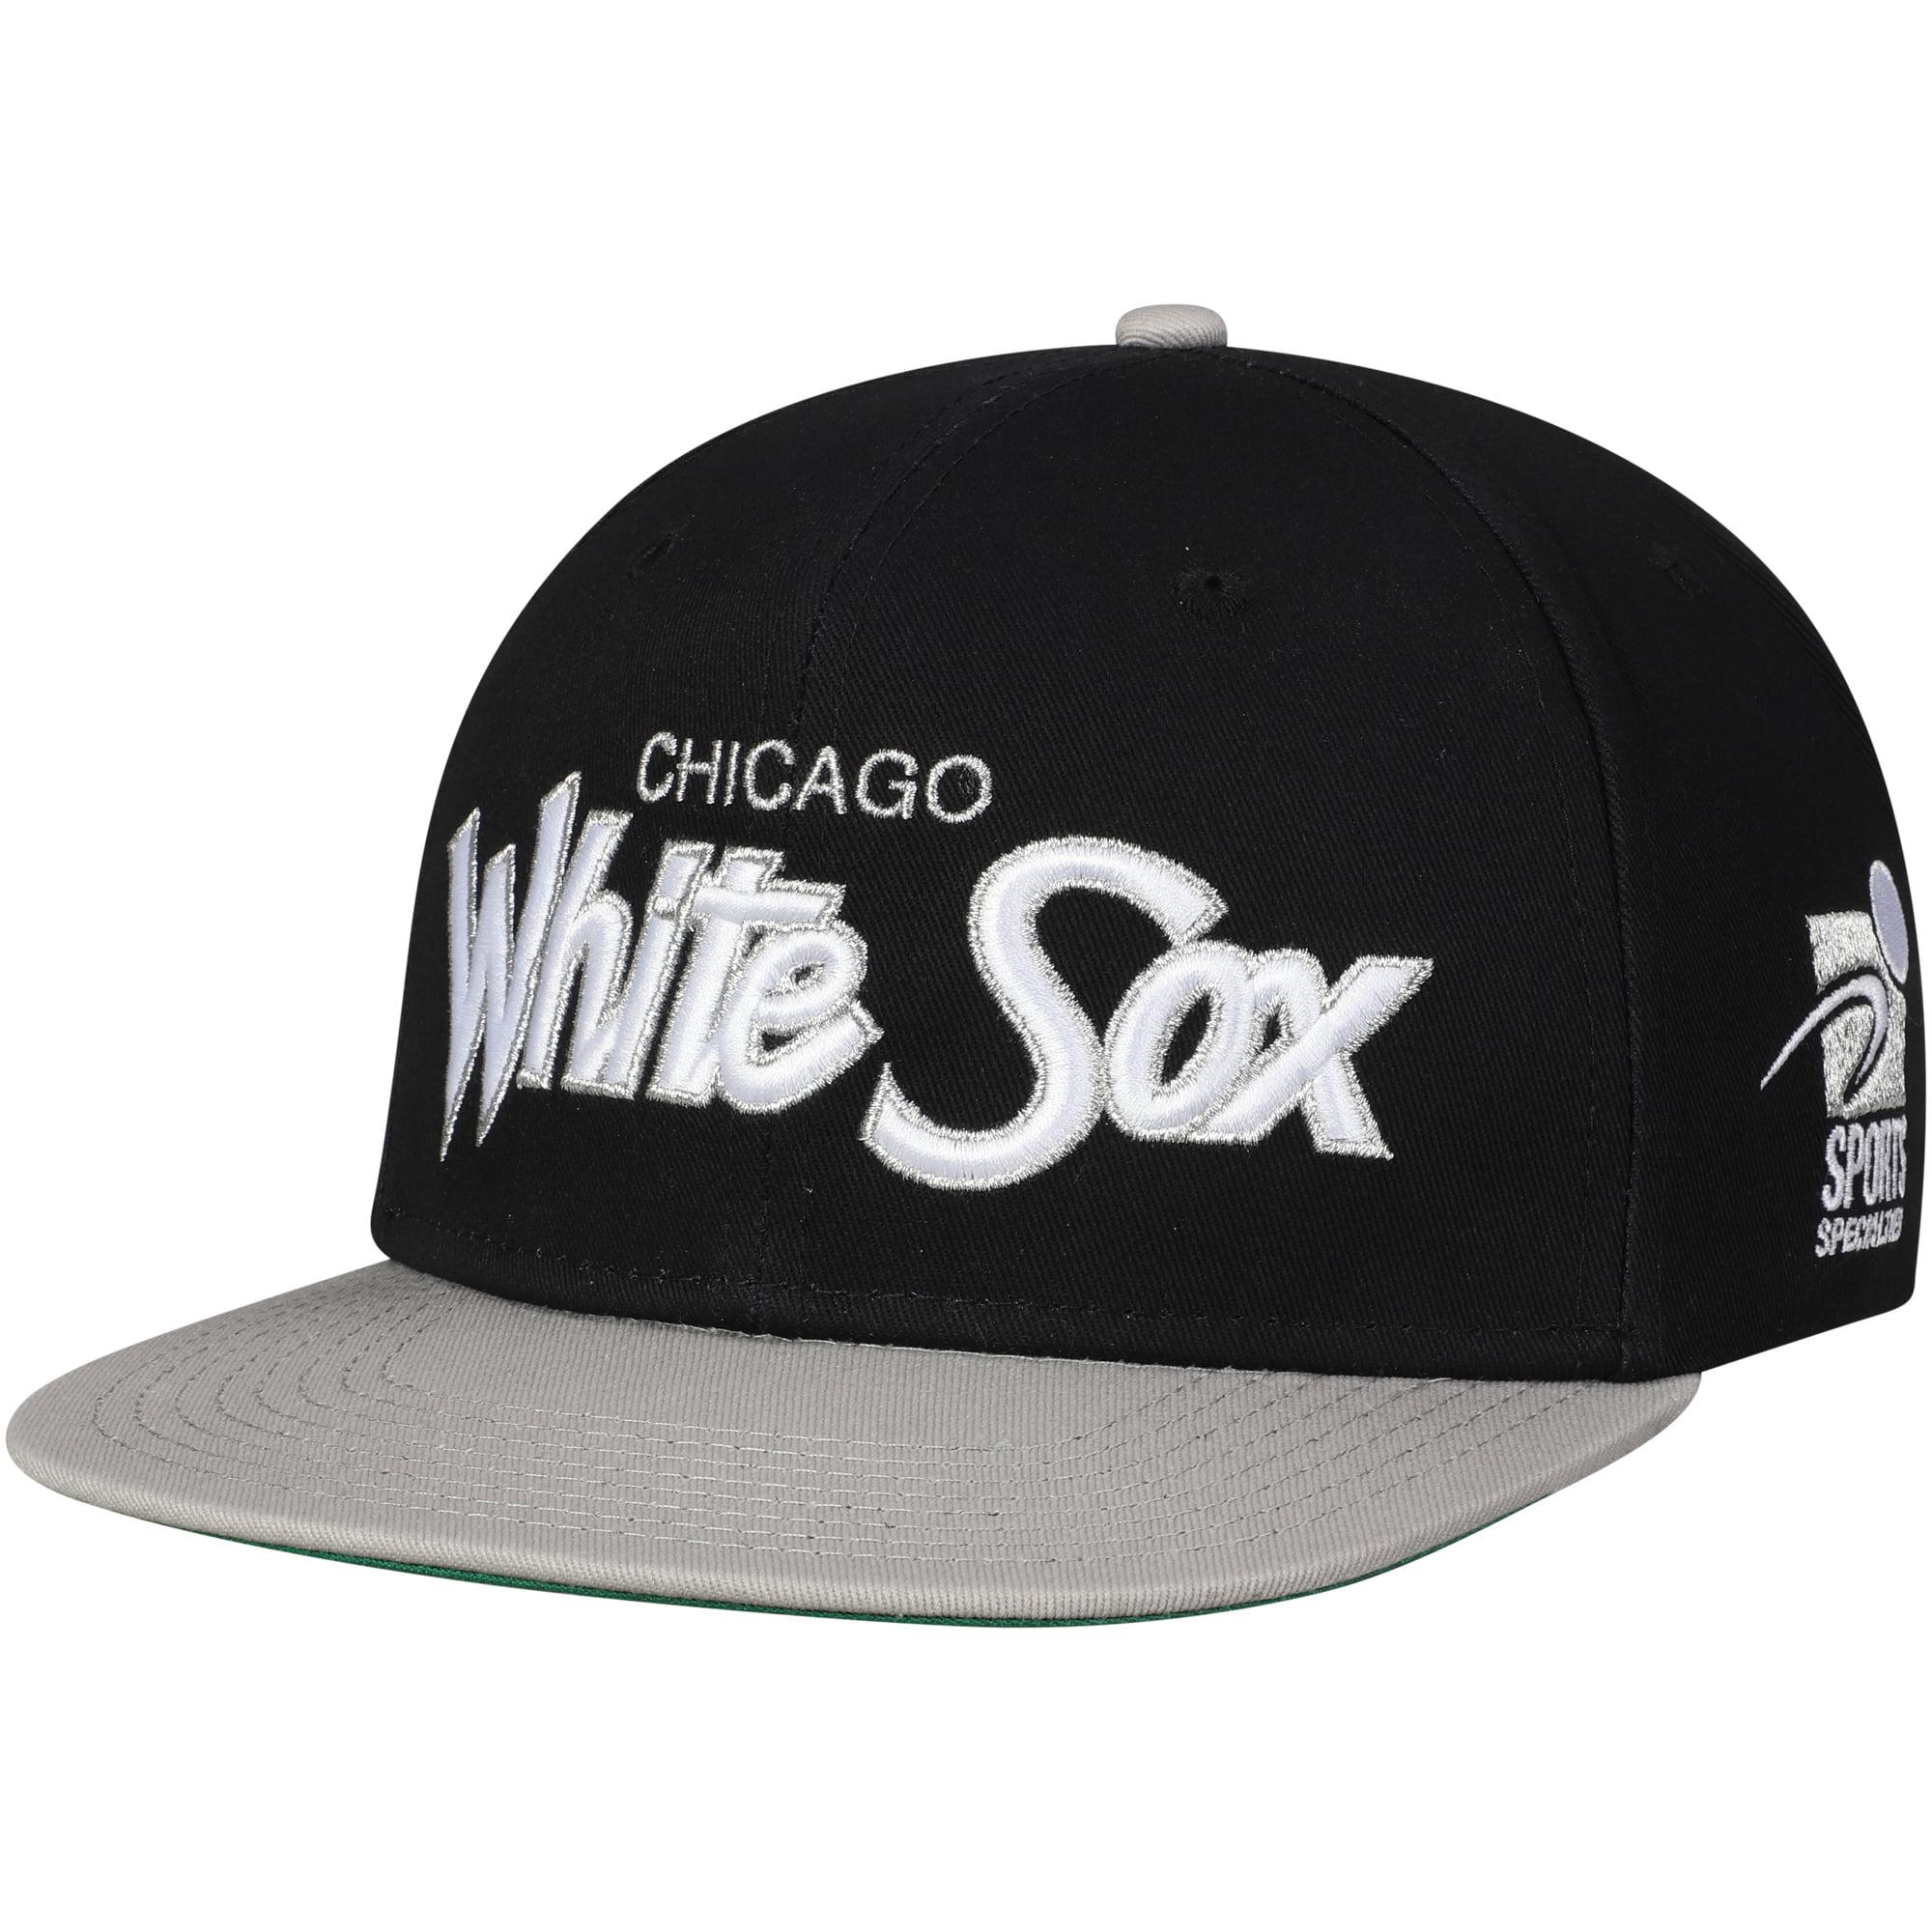 Chicago White Sox Nike Pro Cap Sport Specialties Snapback Adjustable Hat - Black - OSFA